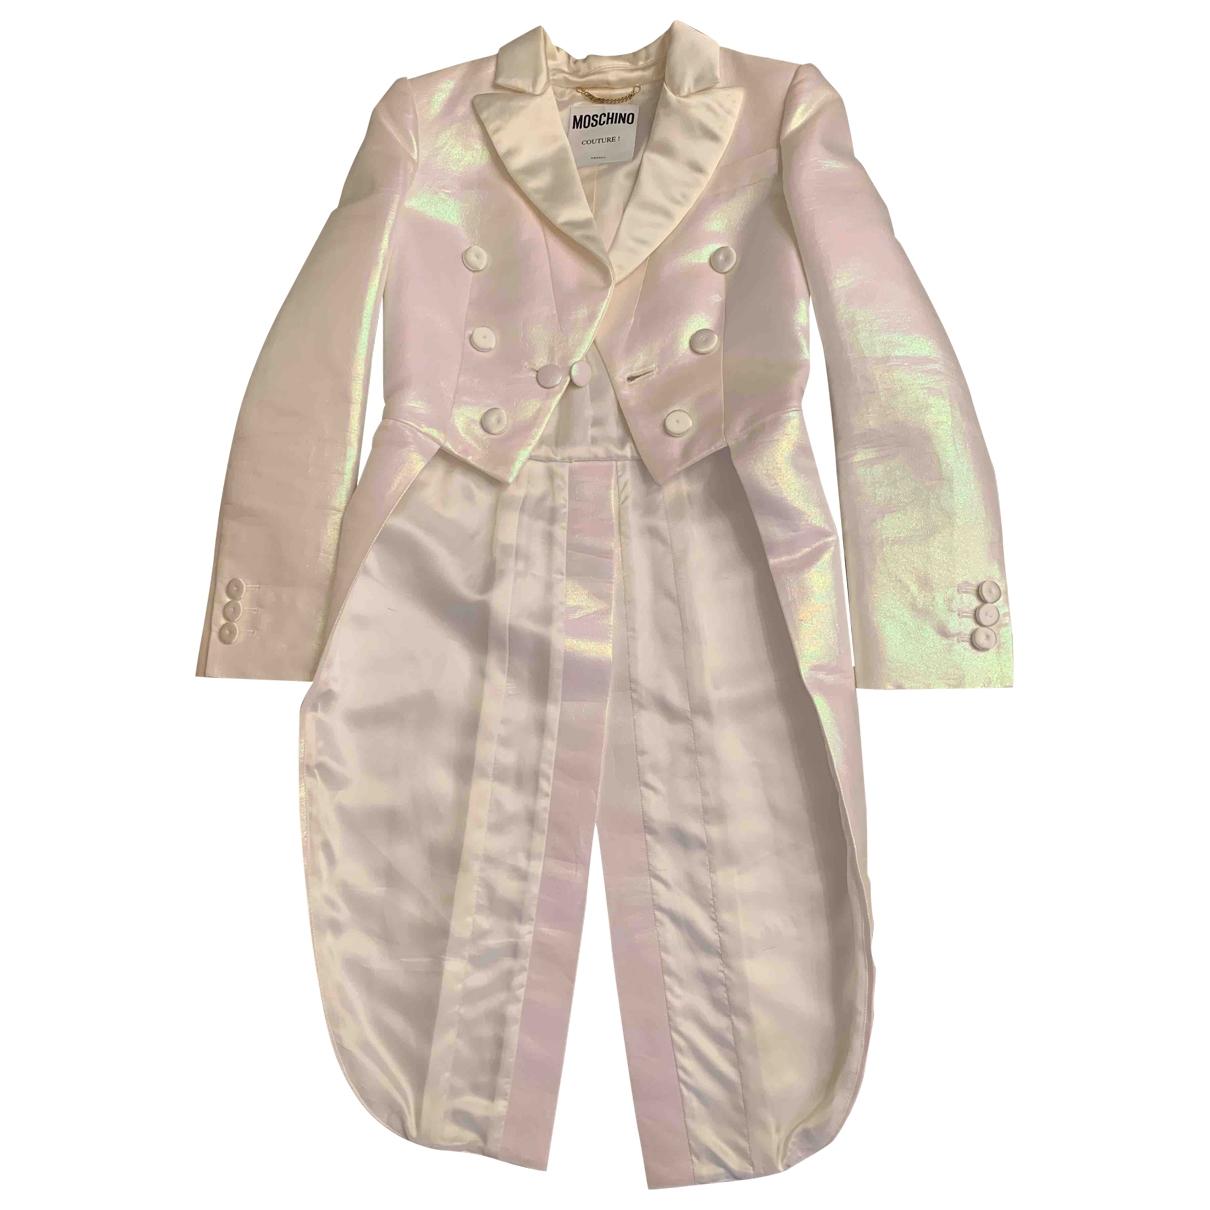 Moschino - Veste   pour femme en coton - blanc